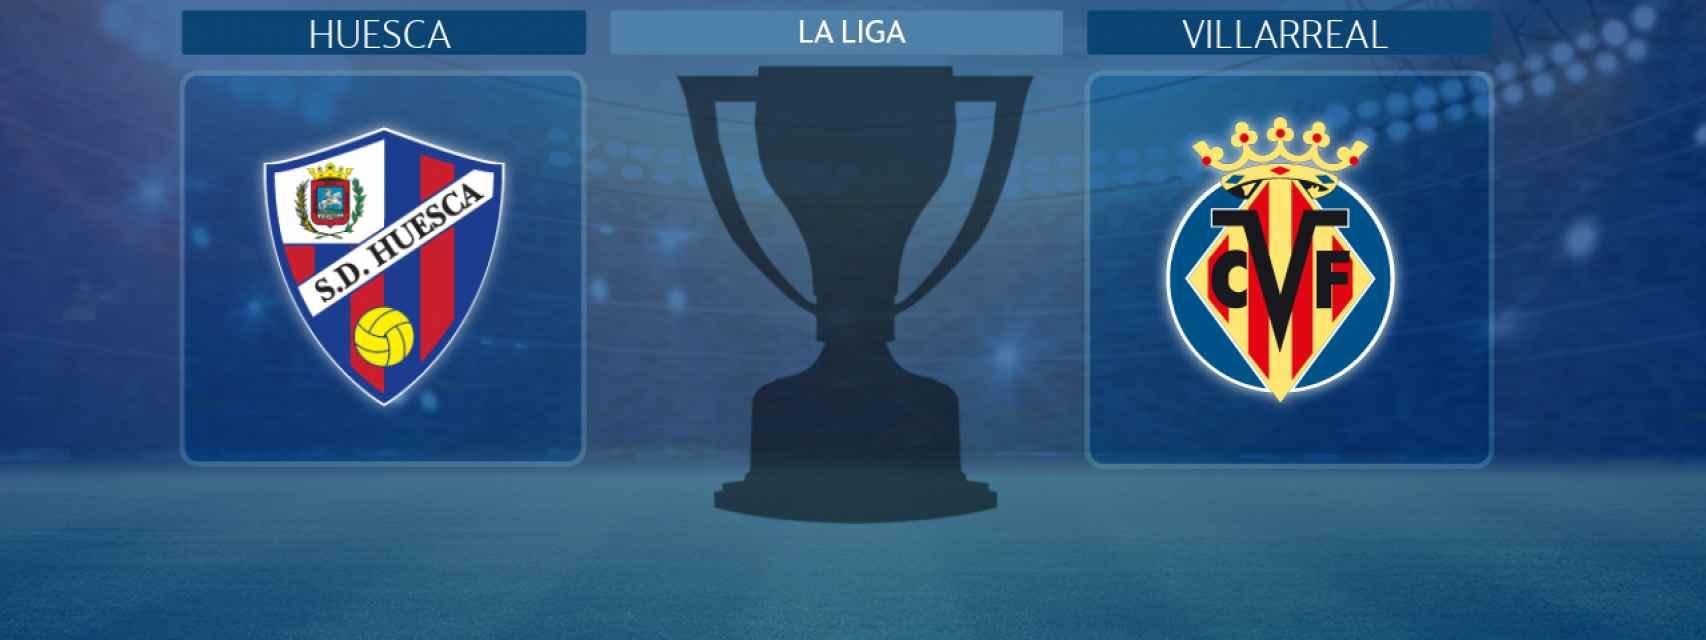 Huesca - Villarreal, partido de La Liga